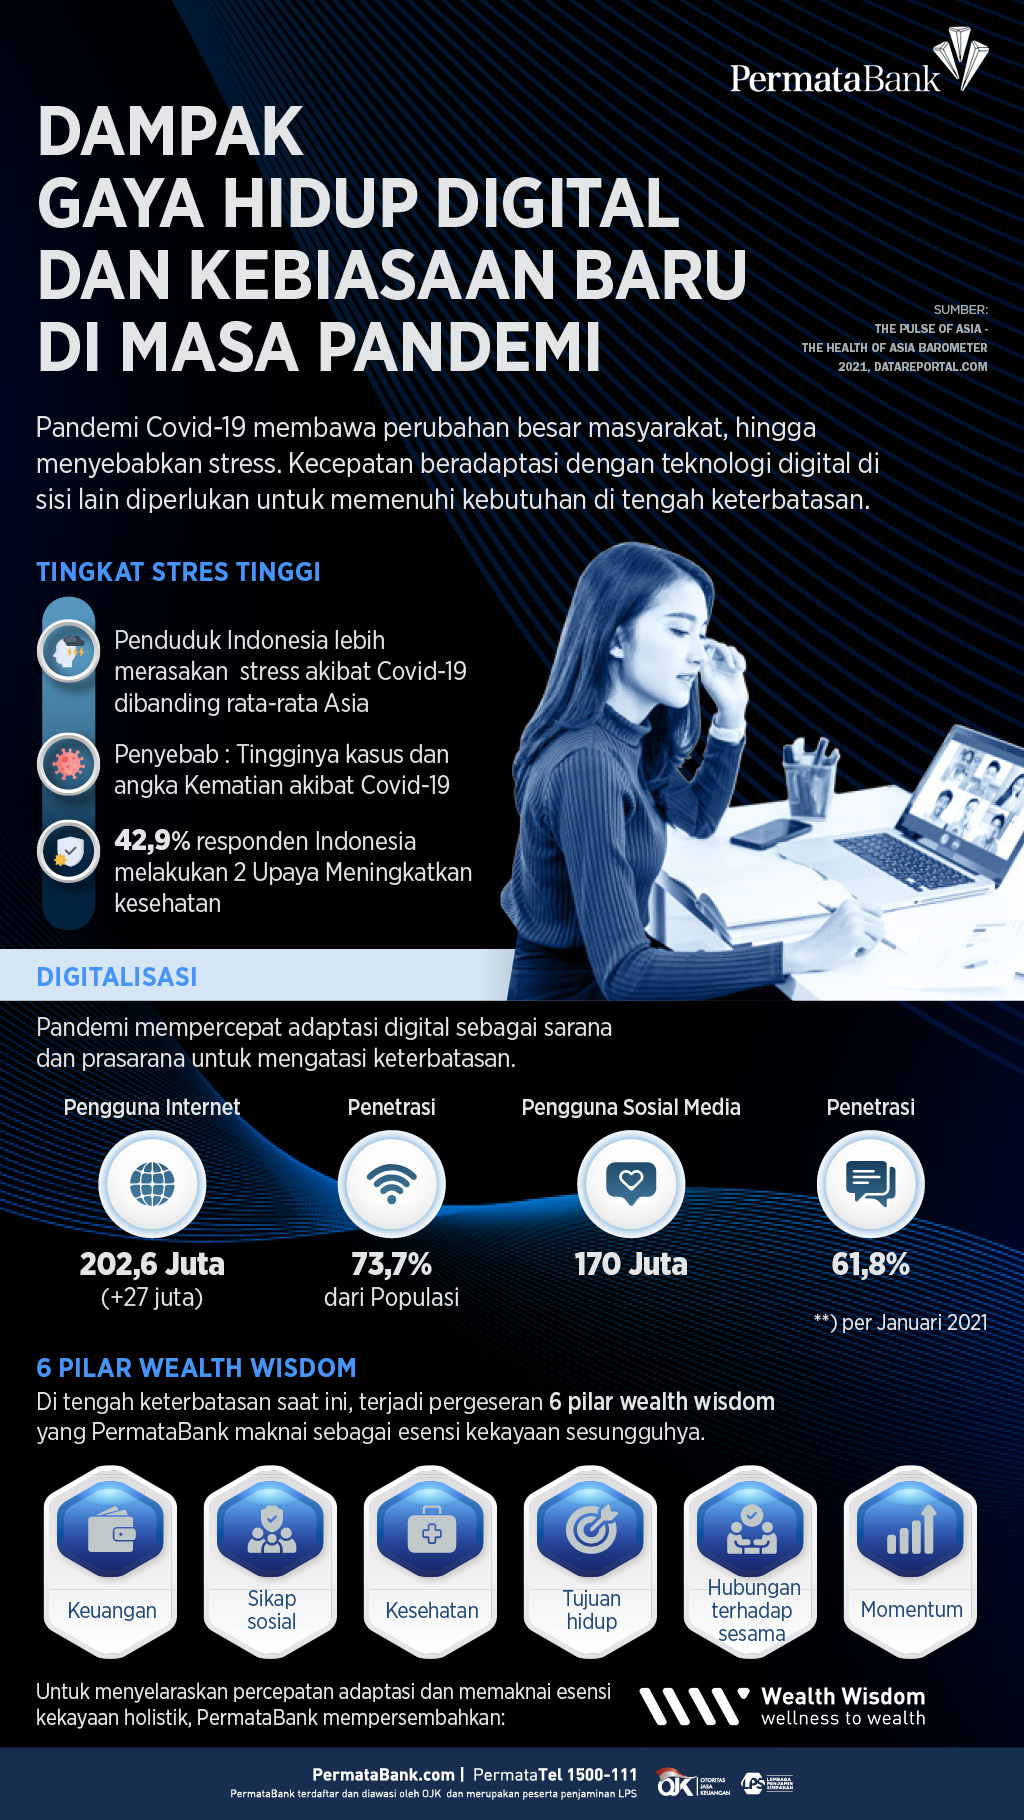 Infografik_Gaya Hidup Digital dan Adaptasi Kebiasaan Baru di Masa Pandemi